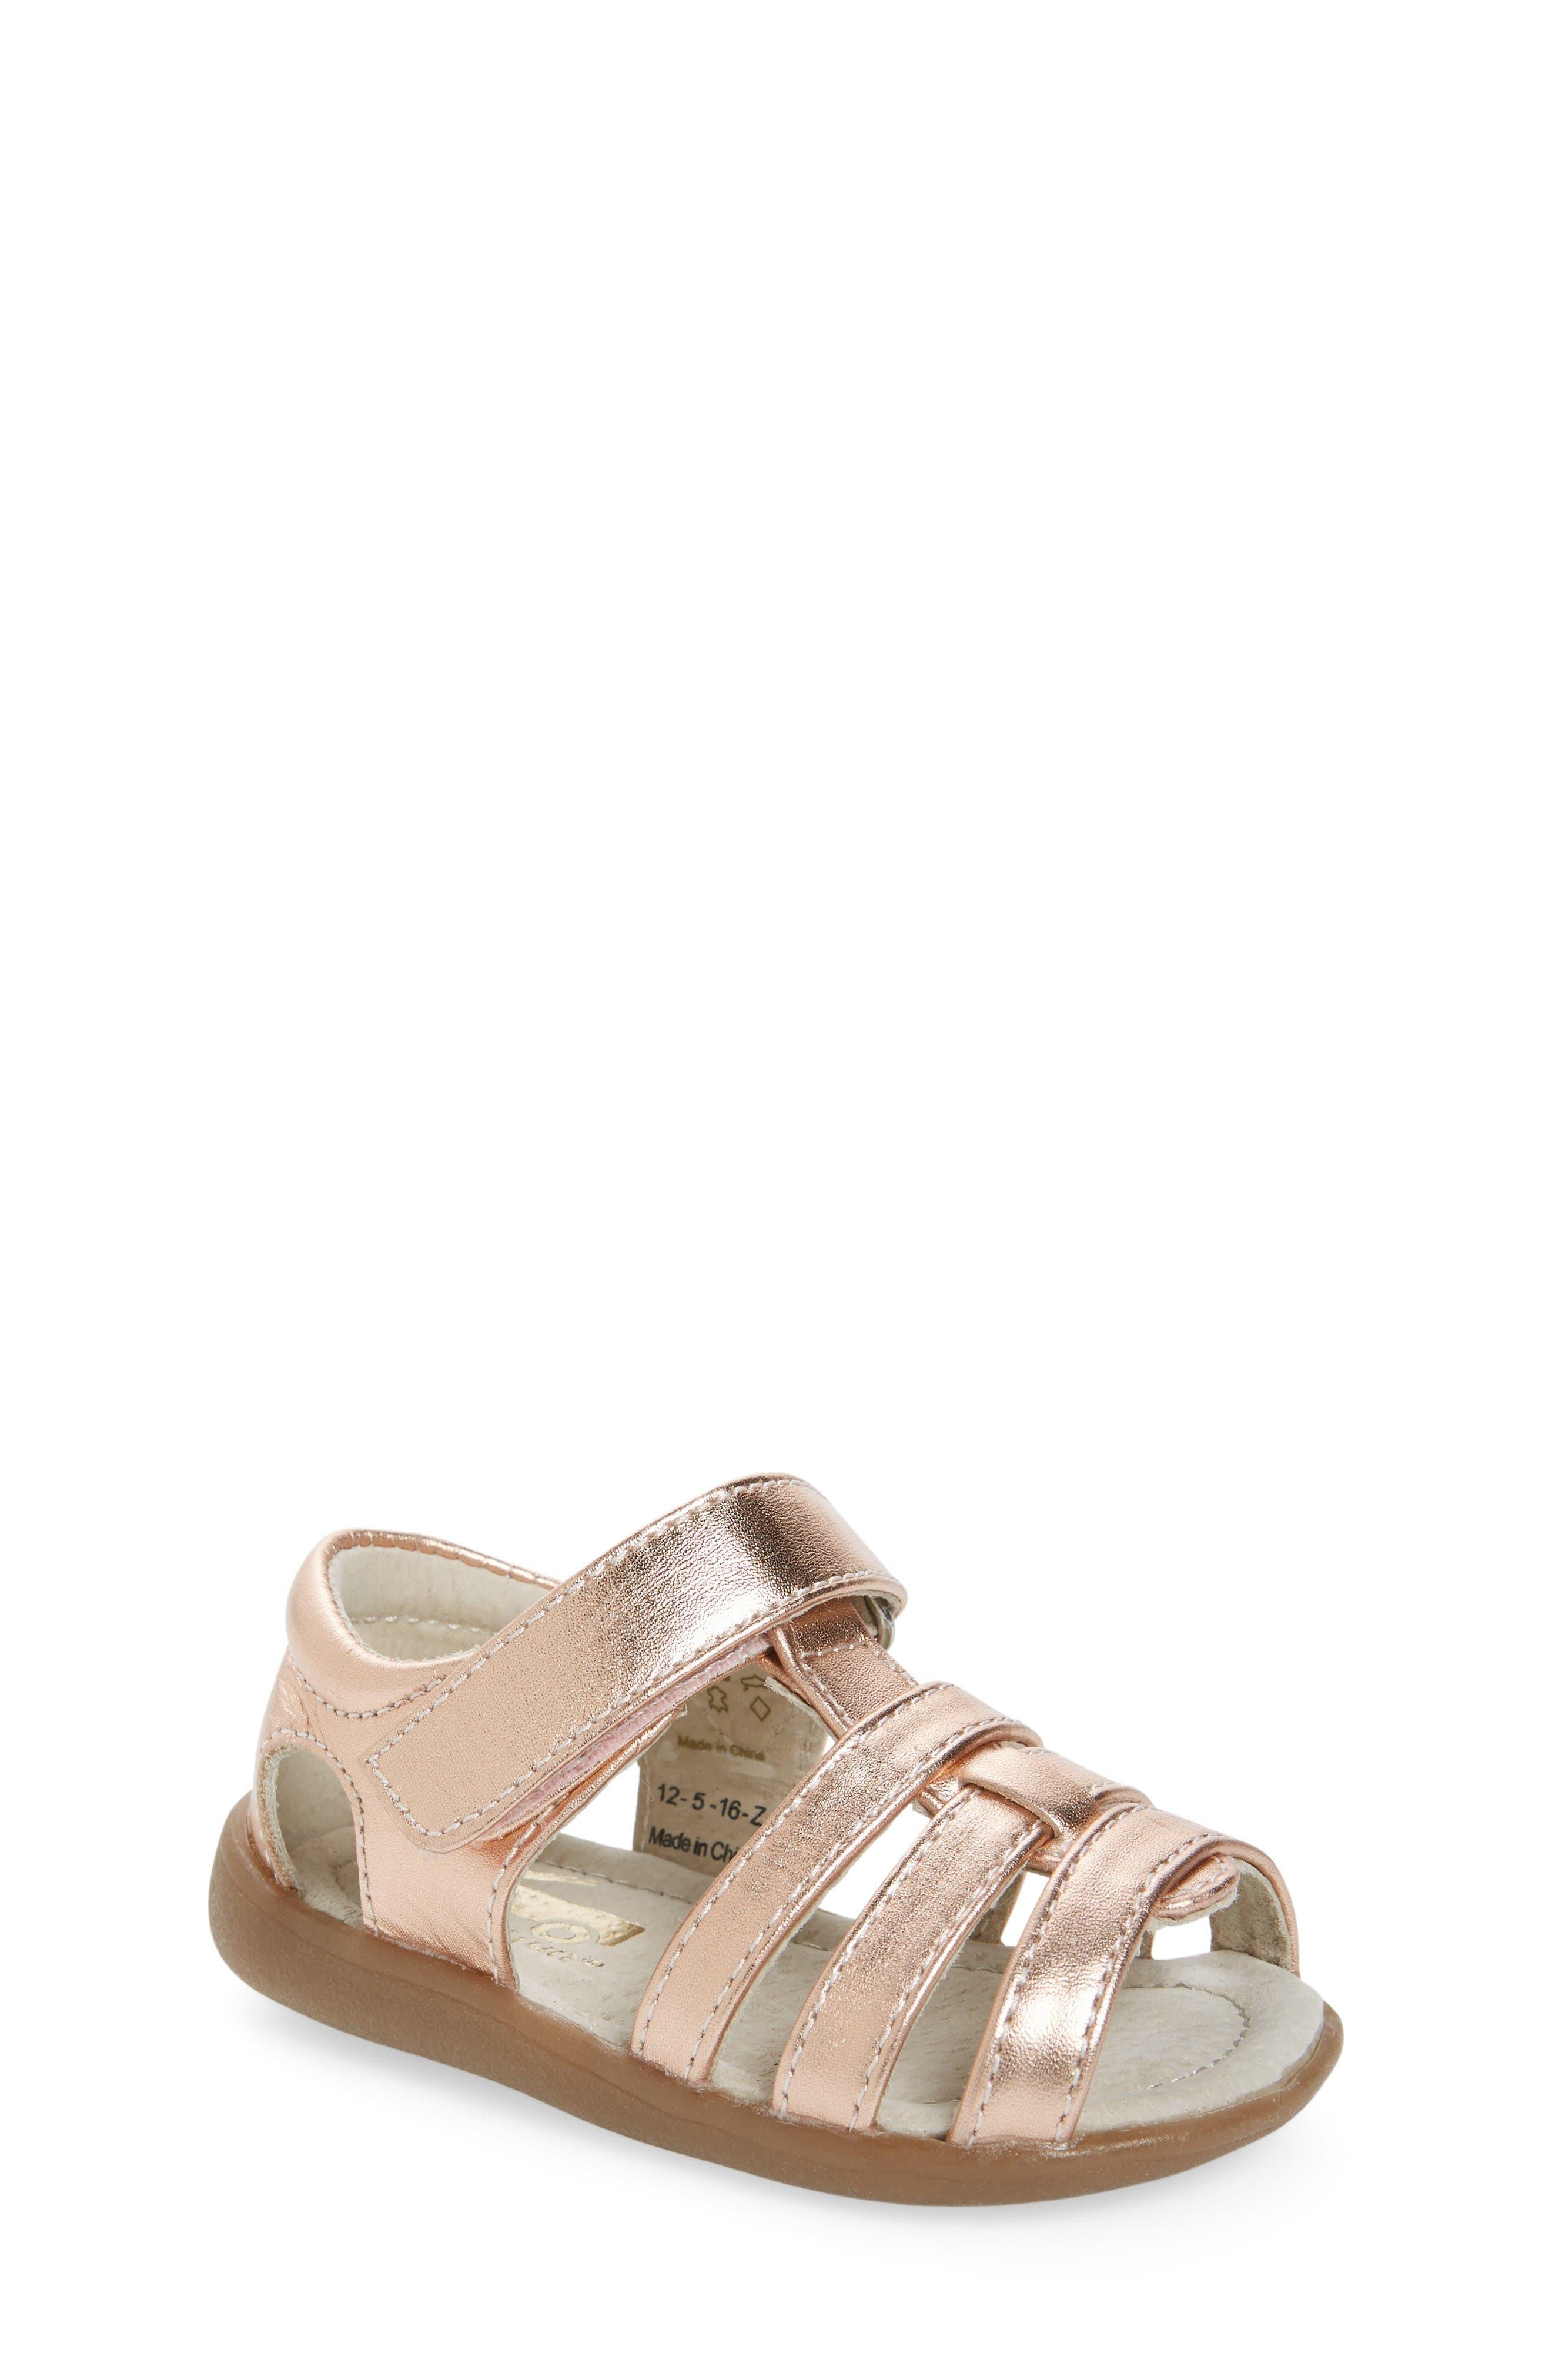 SEE KAI RUN Fe Metallic Leather Gladiator Sandal